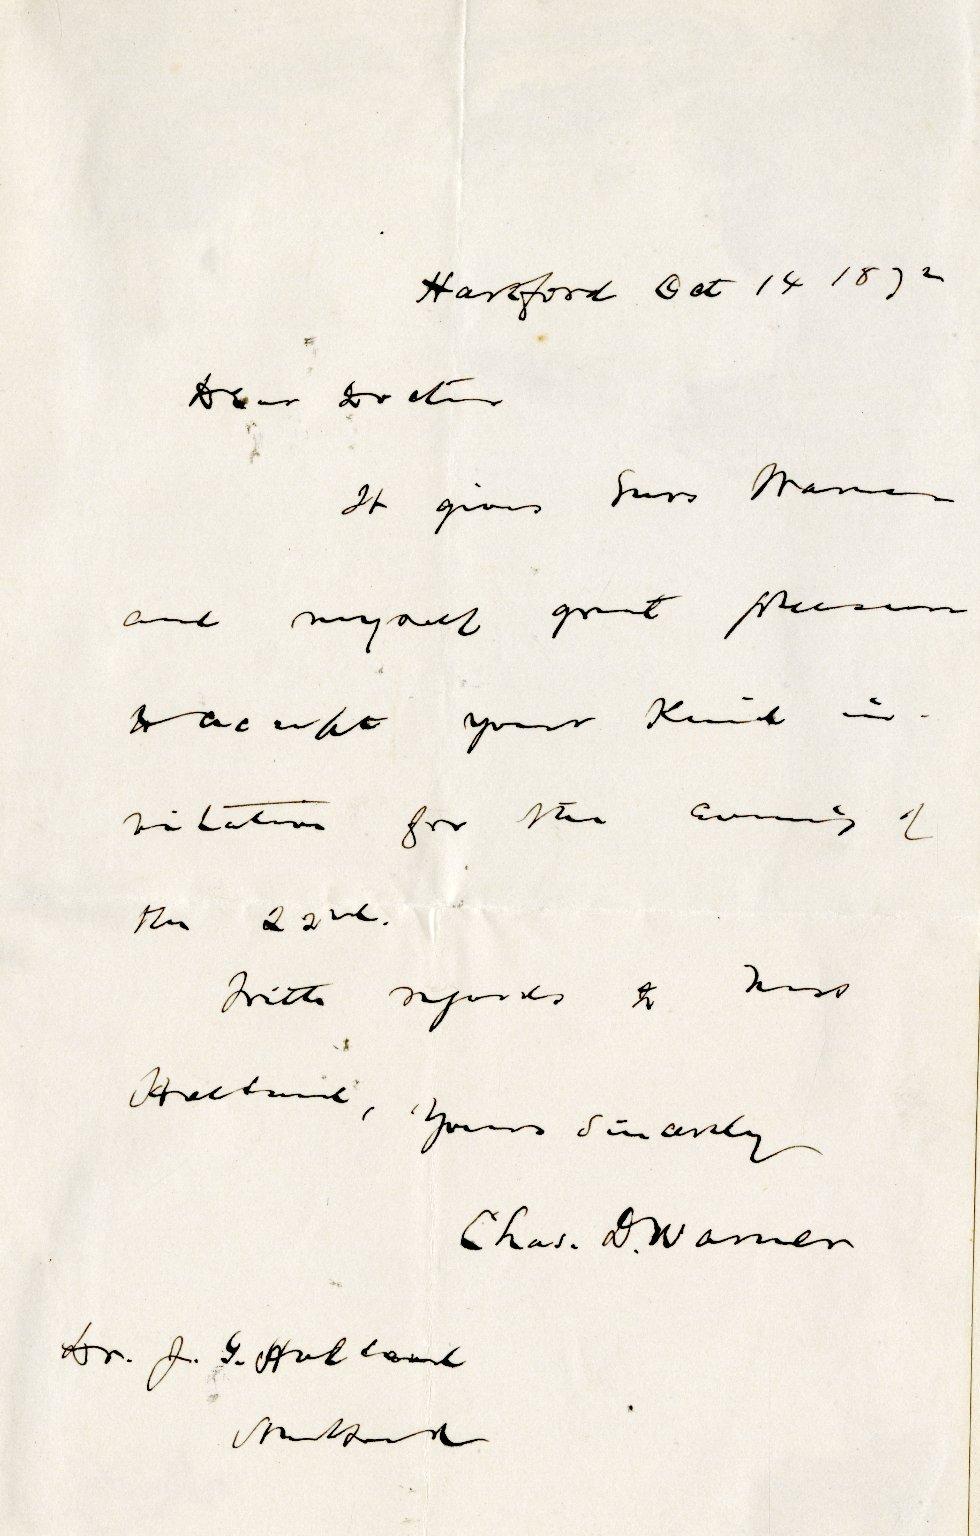 Warner, Charles Dudley. ALS, 1 page, October 14, 1872.